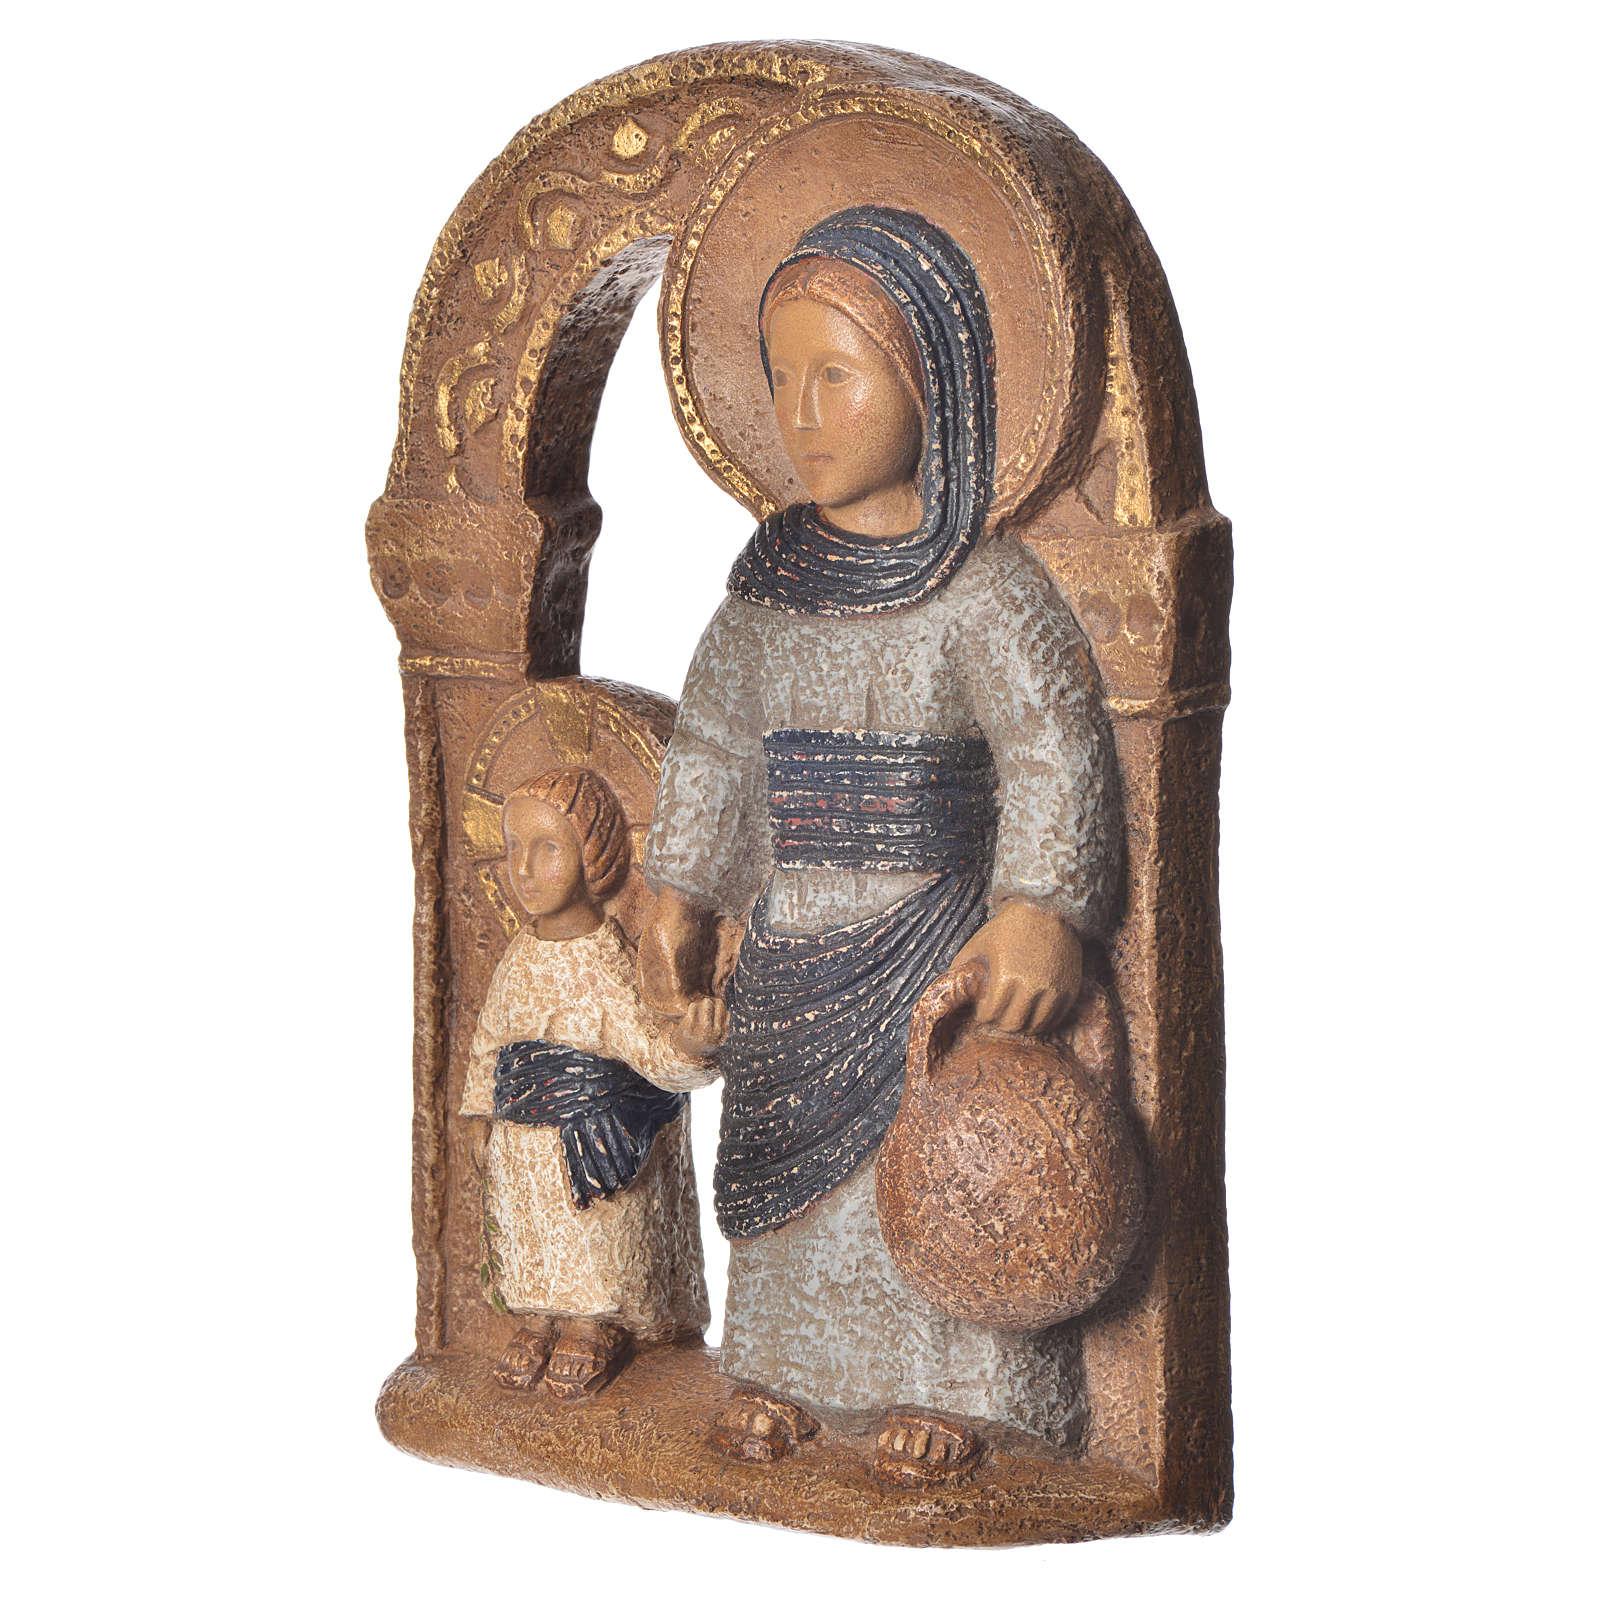 Virgin of Nazareth, blue mantle 35cm, Bethléem stone 4